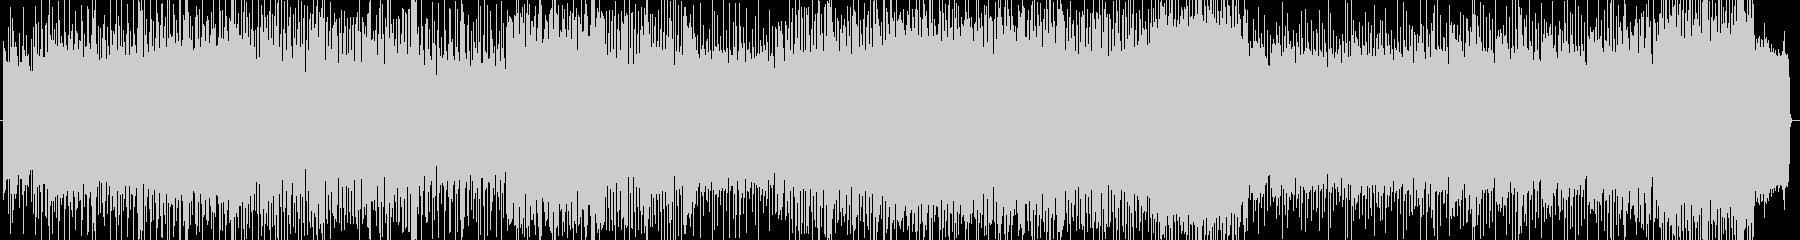 「HR/HM」「ROCK」BGM105の未再生の波形